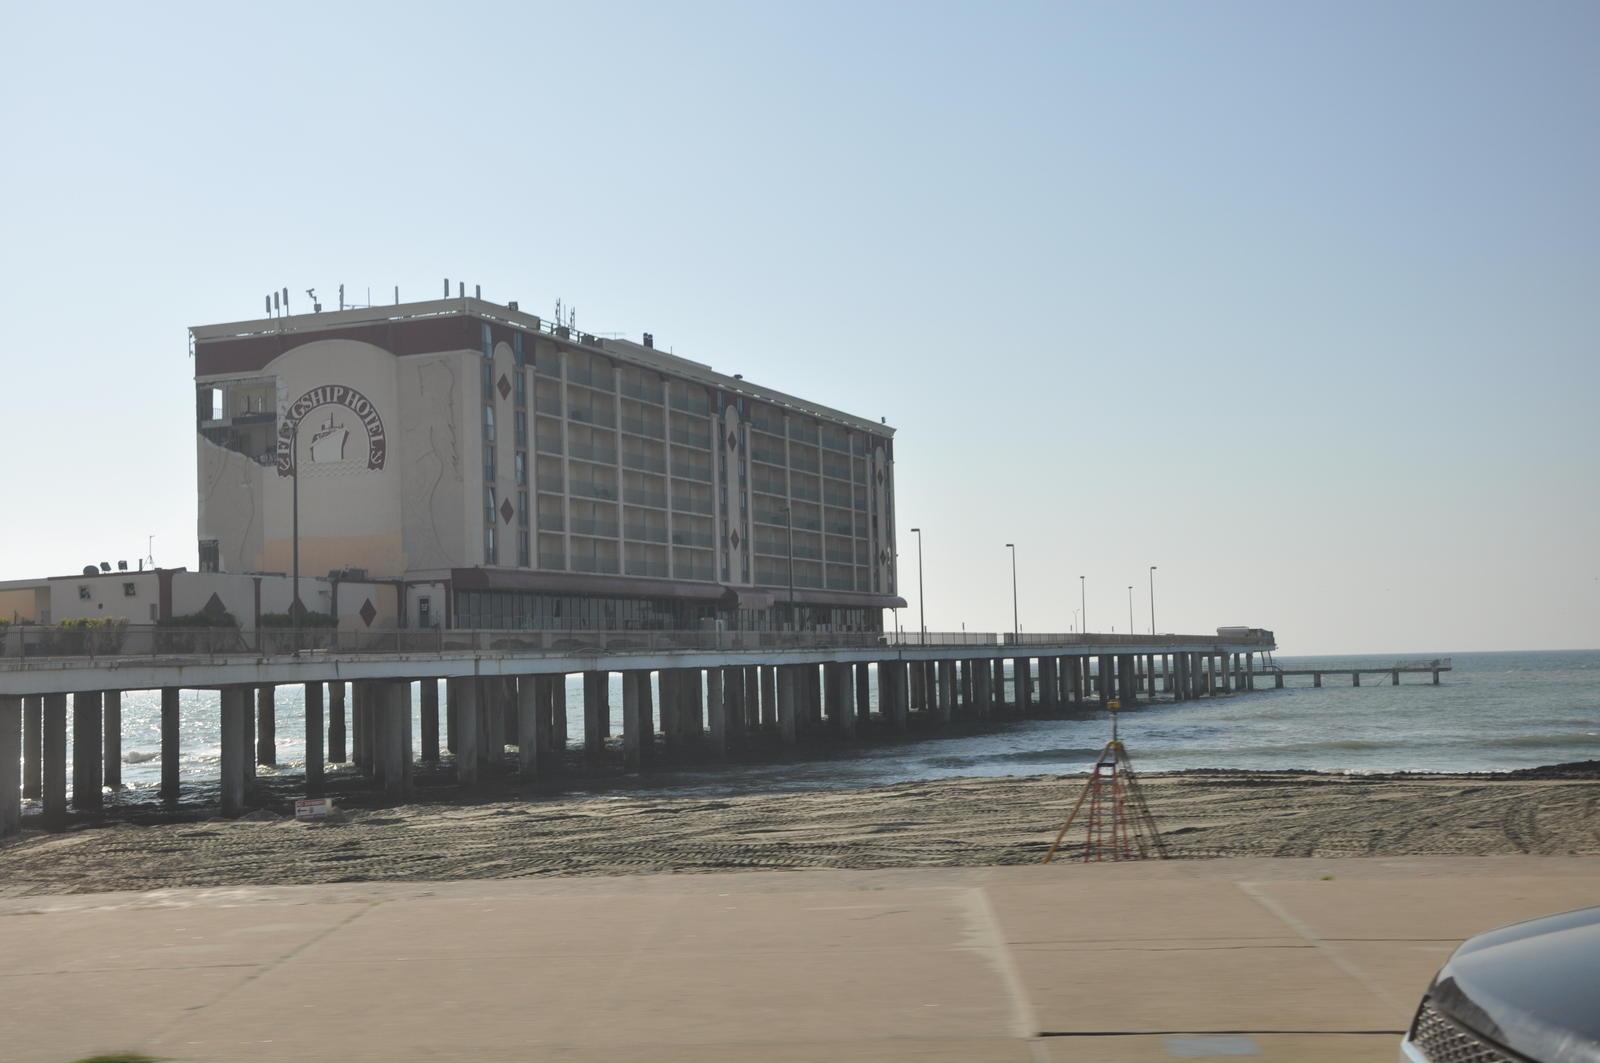 Any Beachfront Hotels In Galveston Austin West Spring Break